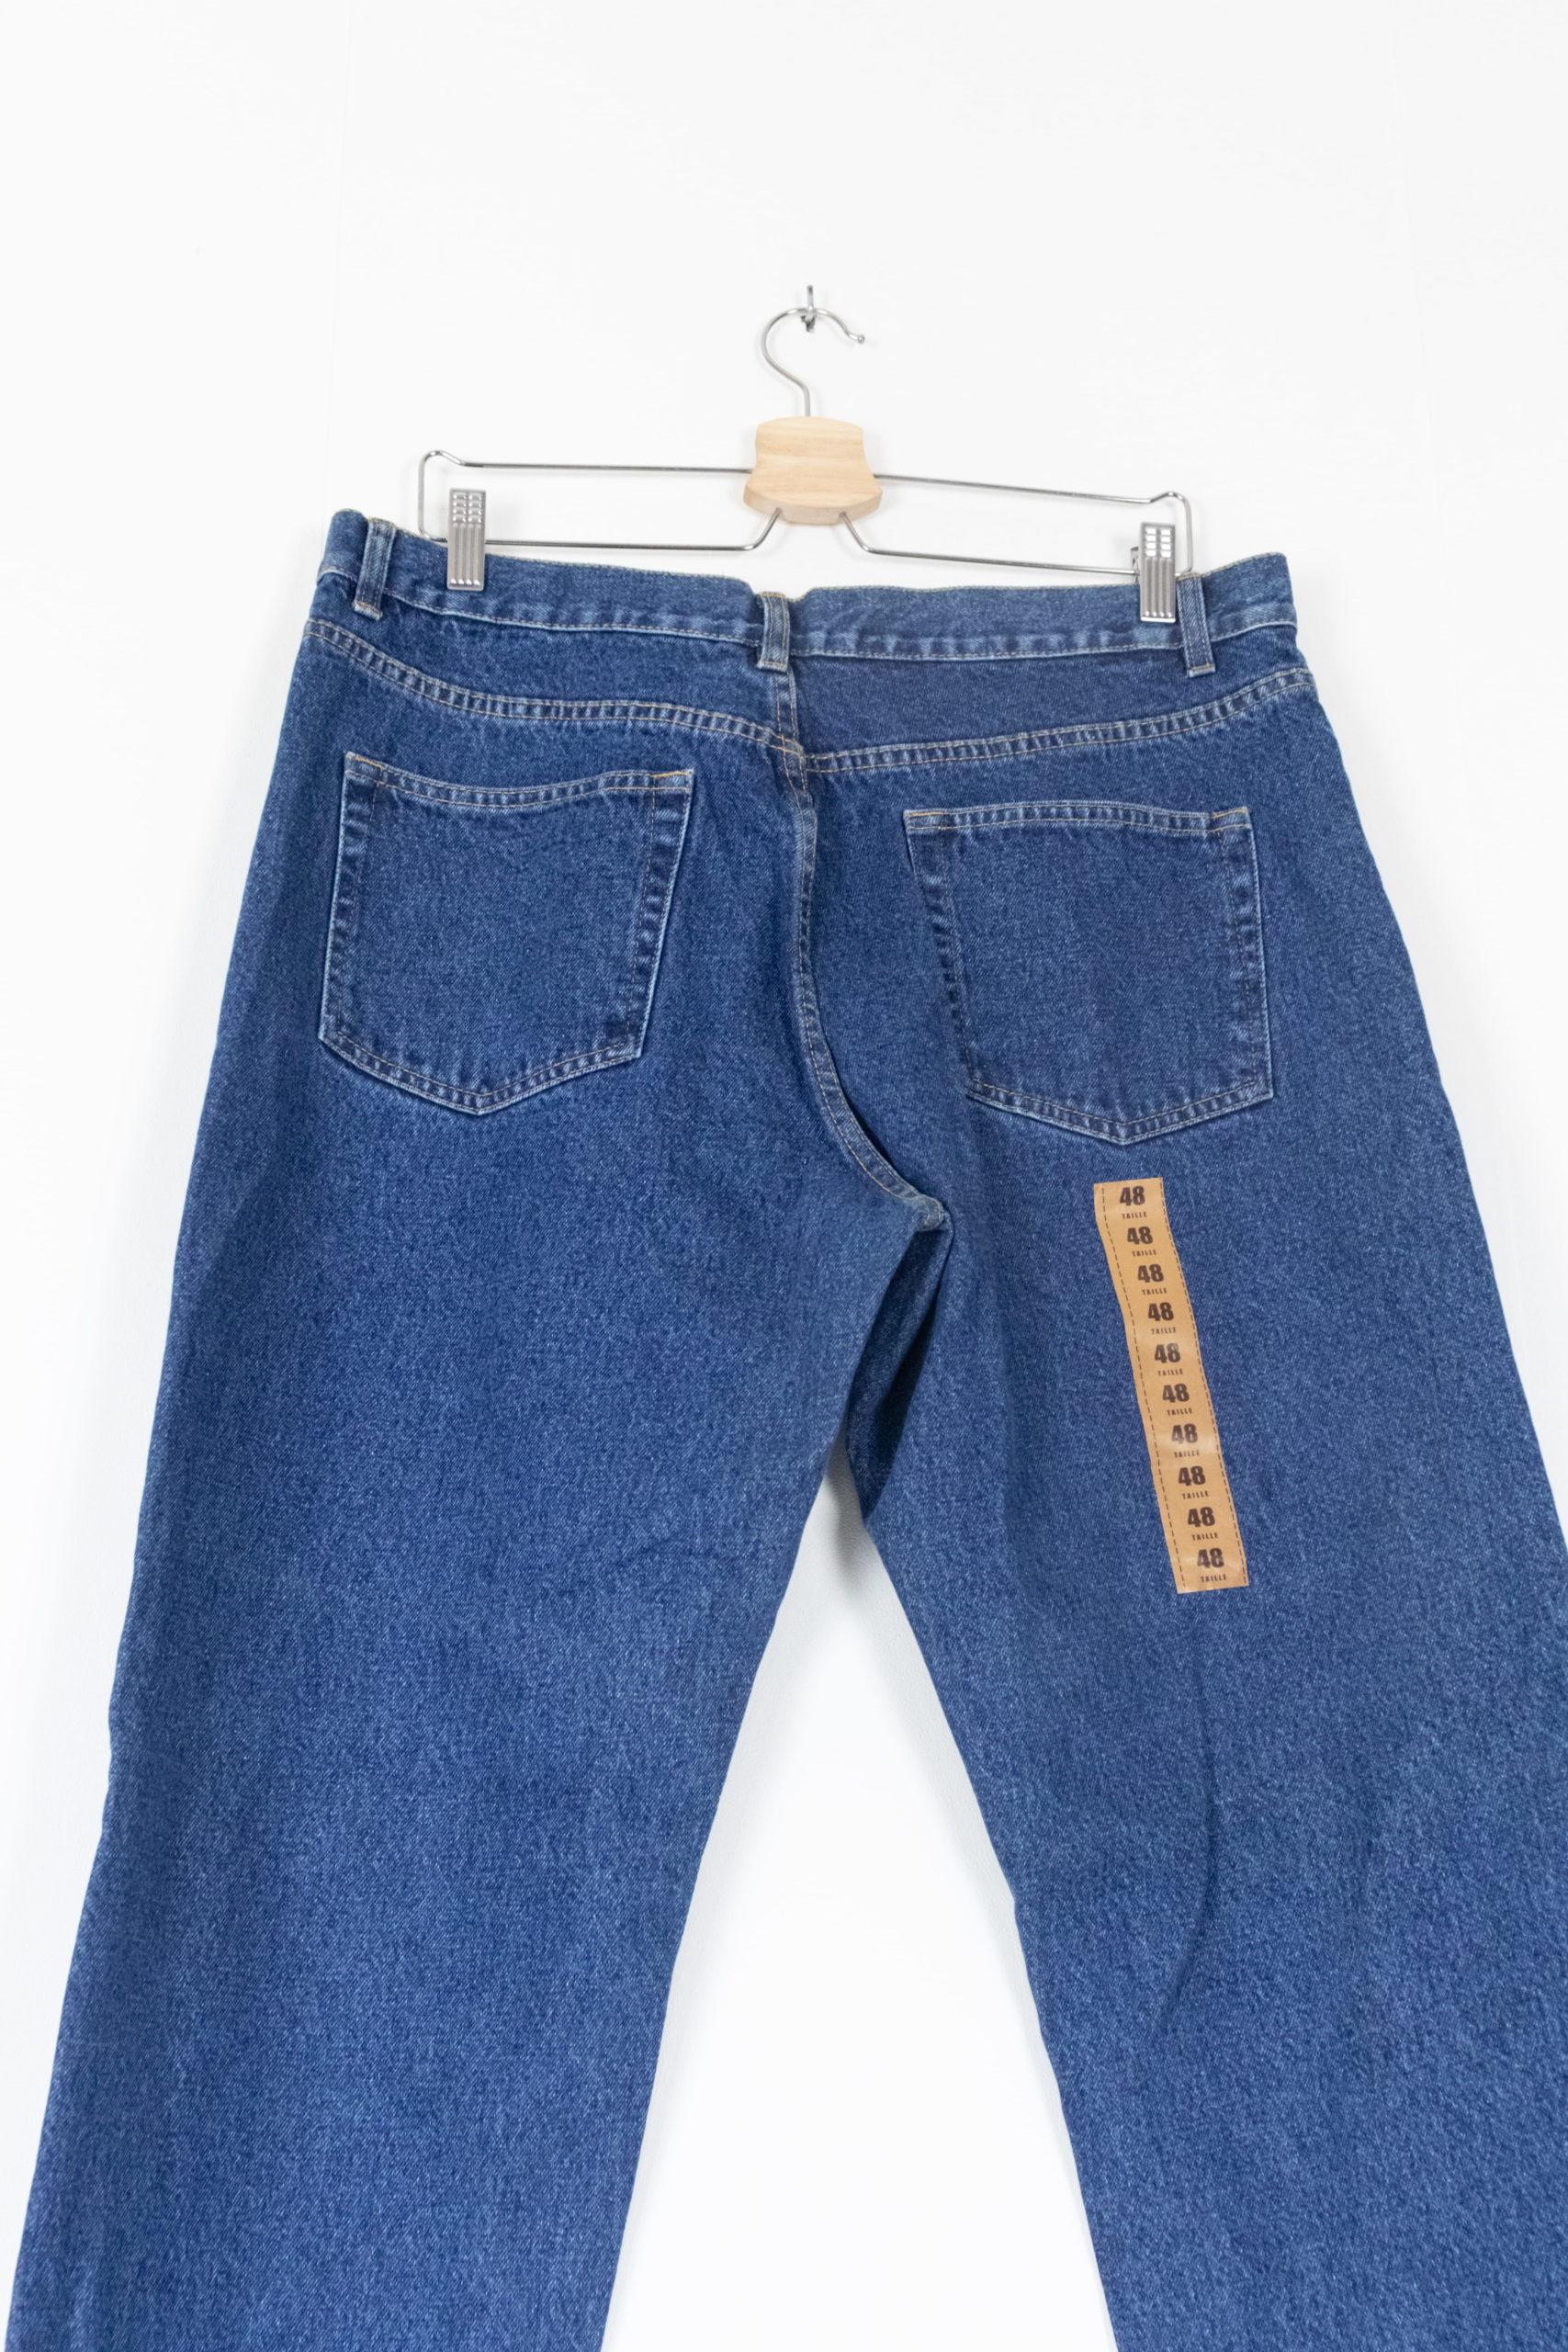 Jean taille haute bleu brut 2